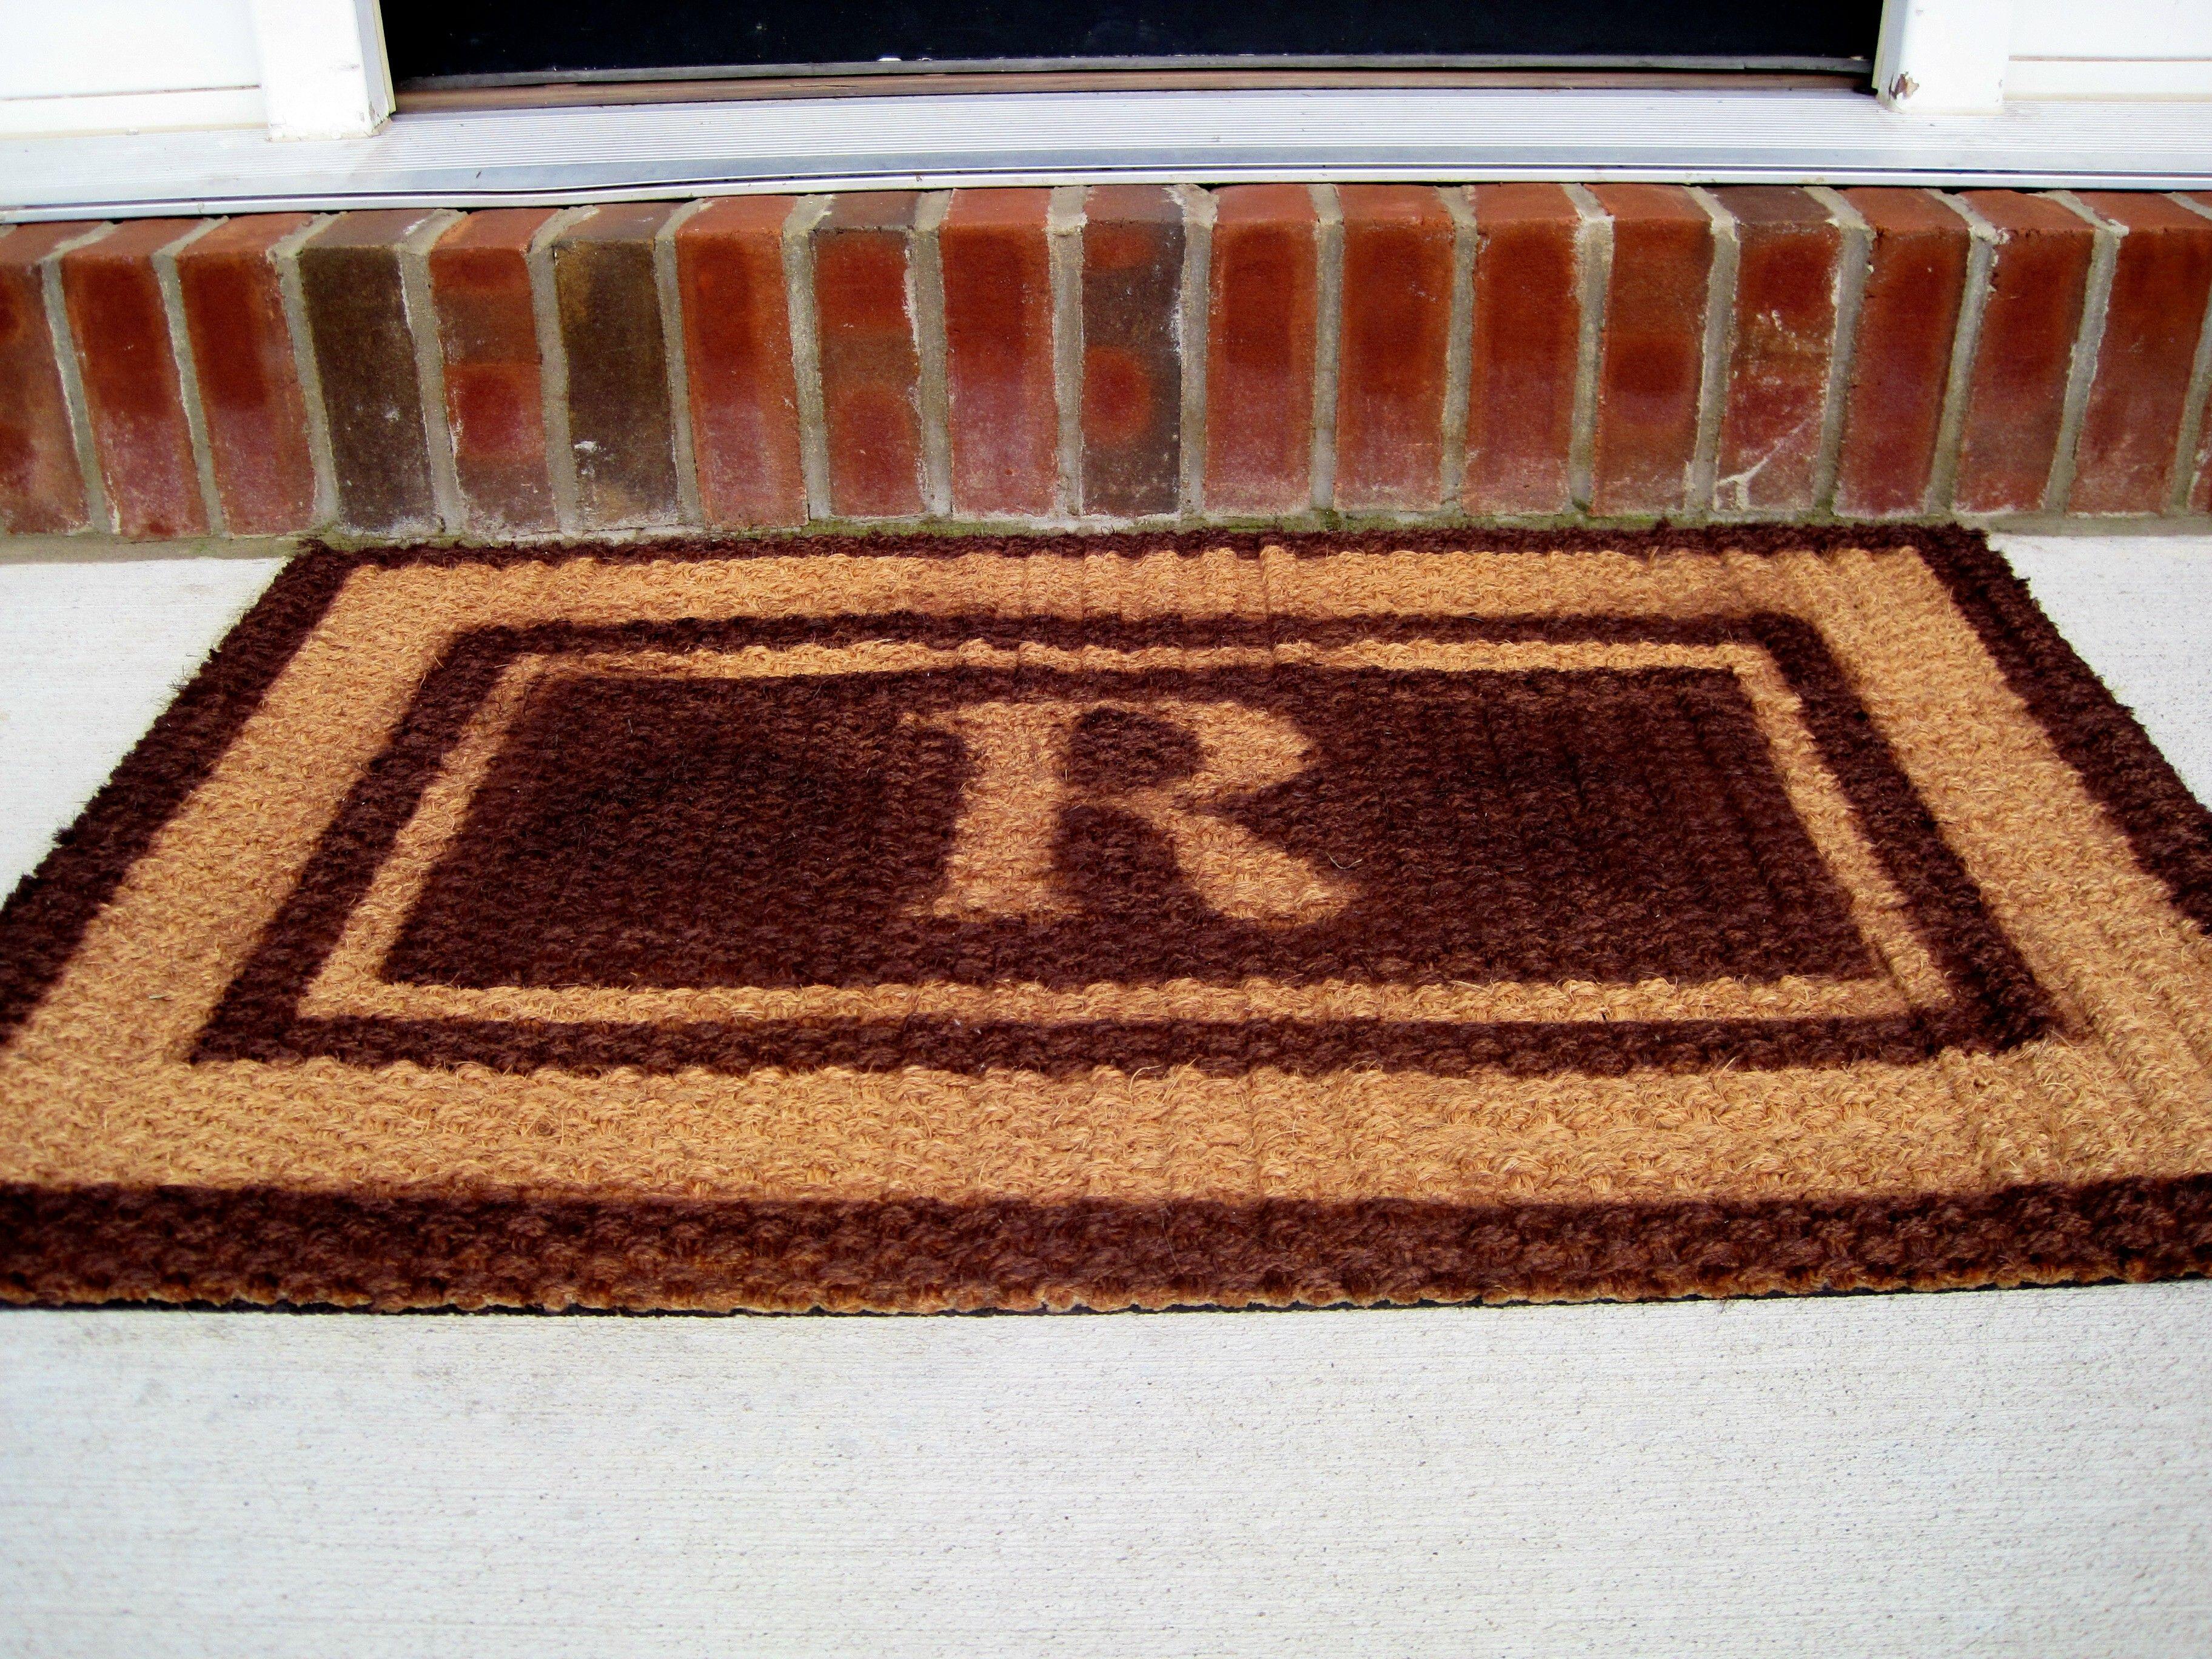 Personalized doormat pb knock off